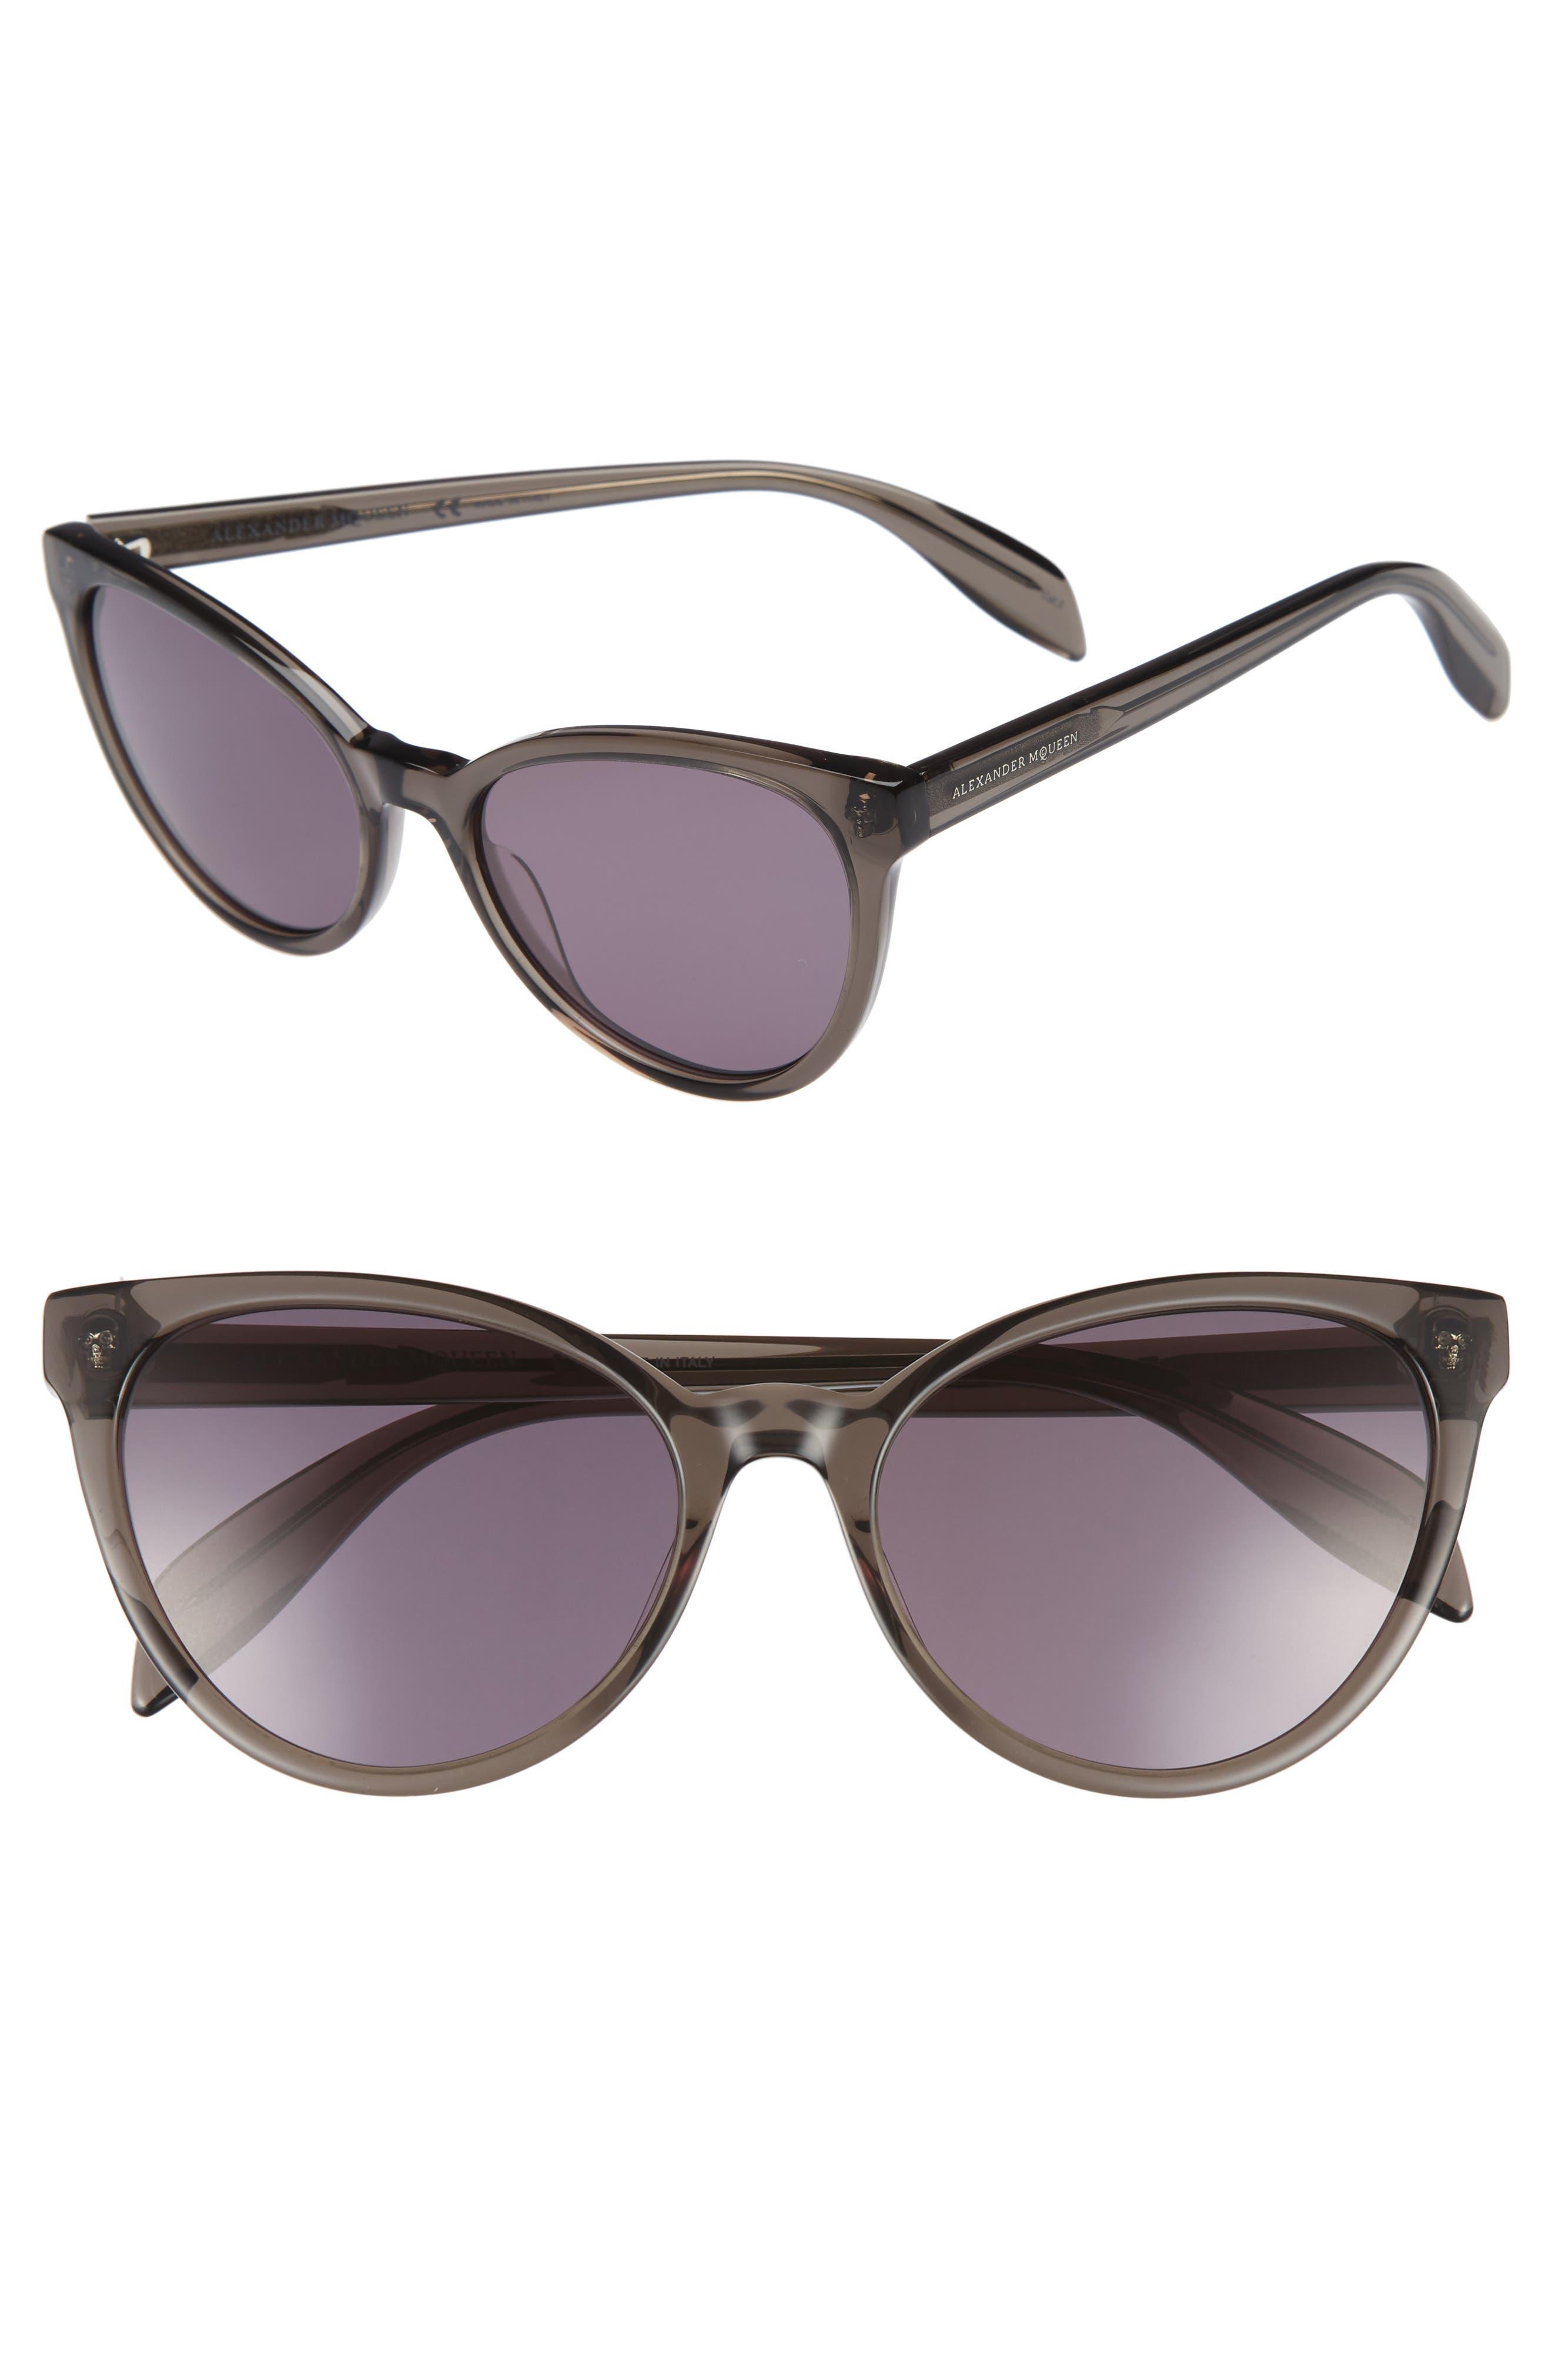 55mm Cat Eye Sunglasses,                         Main,                         color, 020